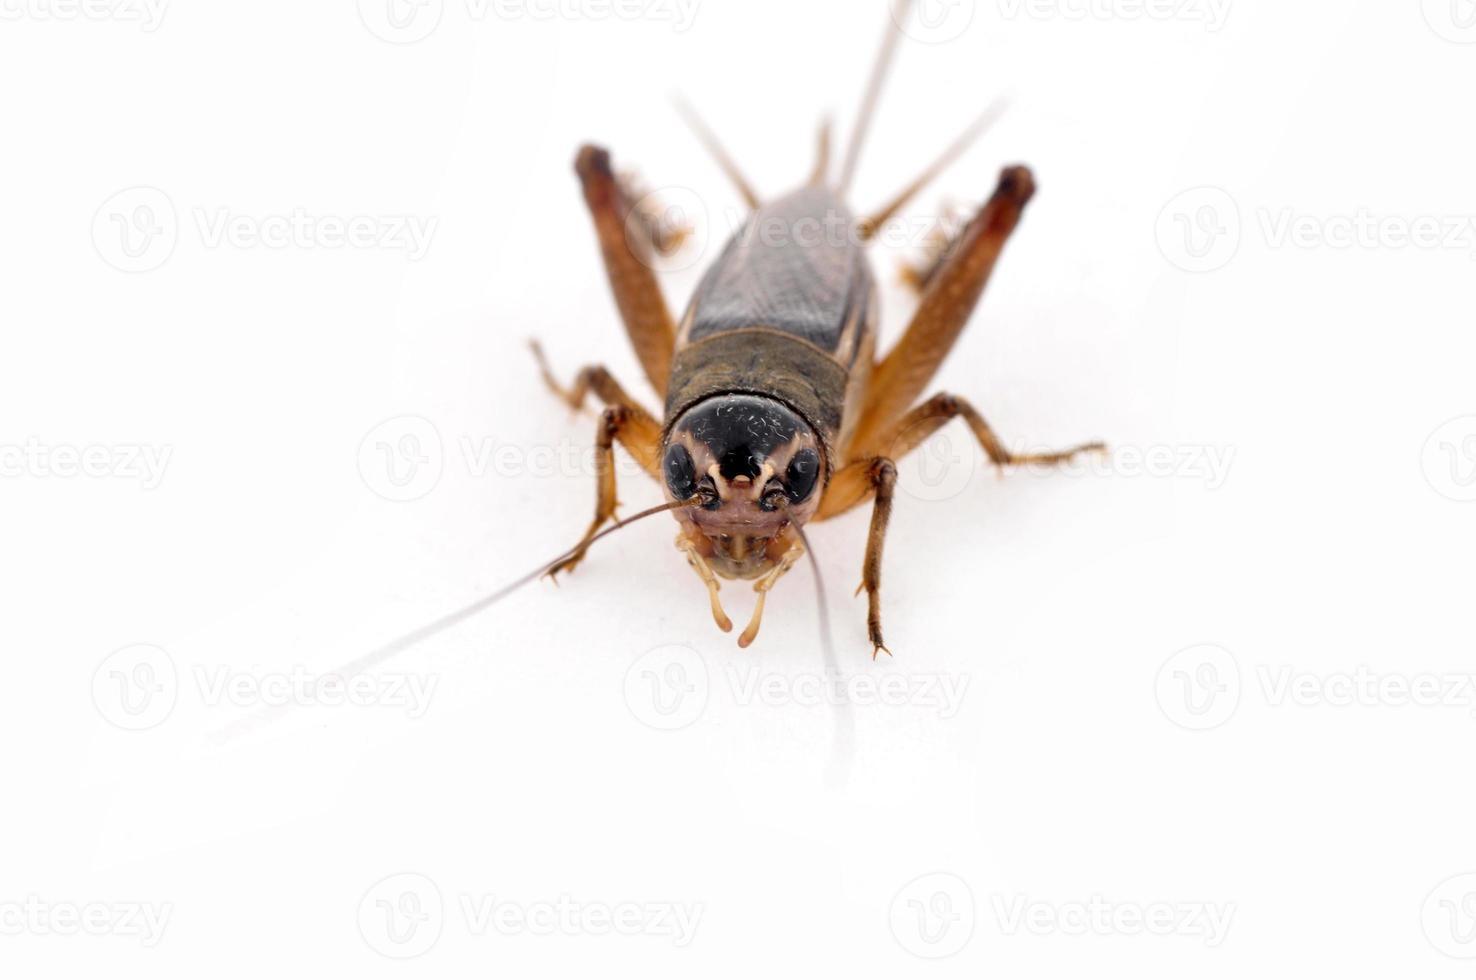 cricket su uno sfondo bianco foto